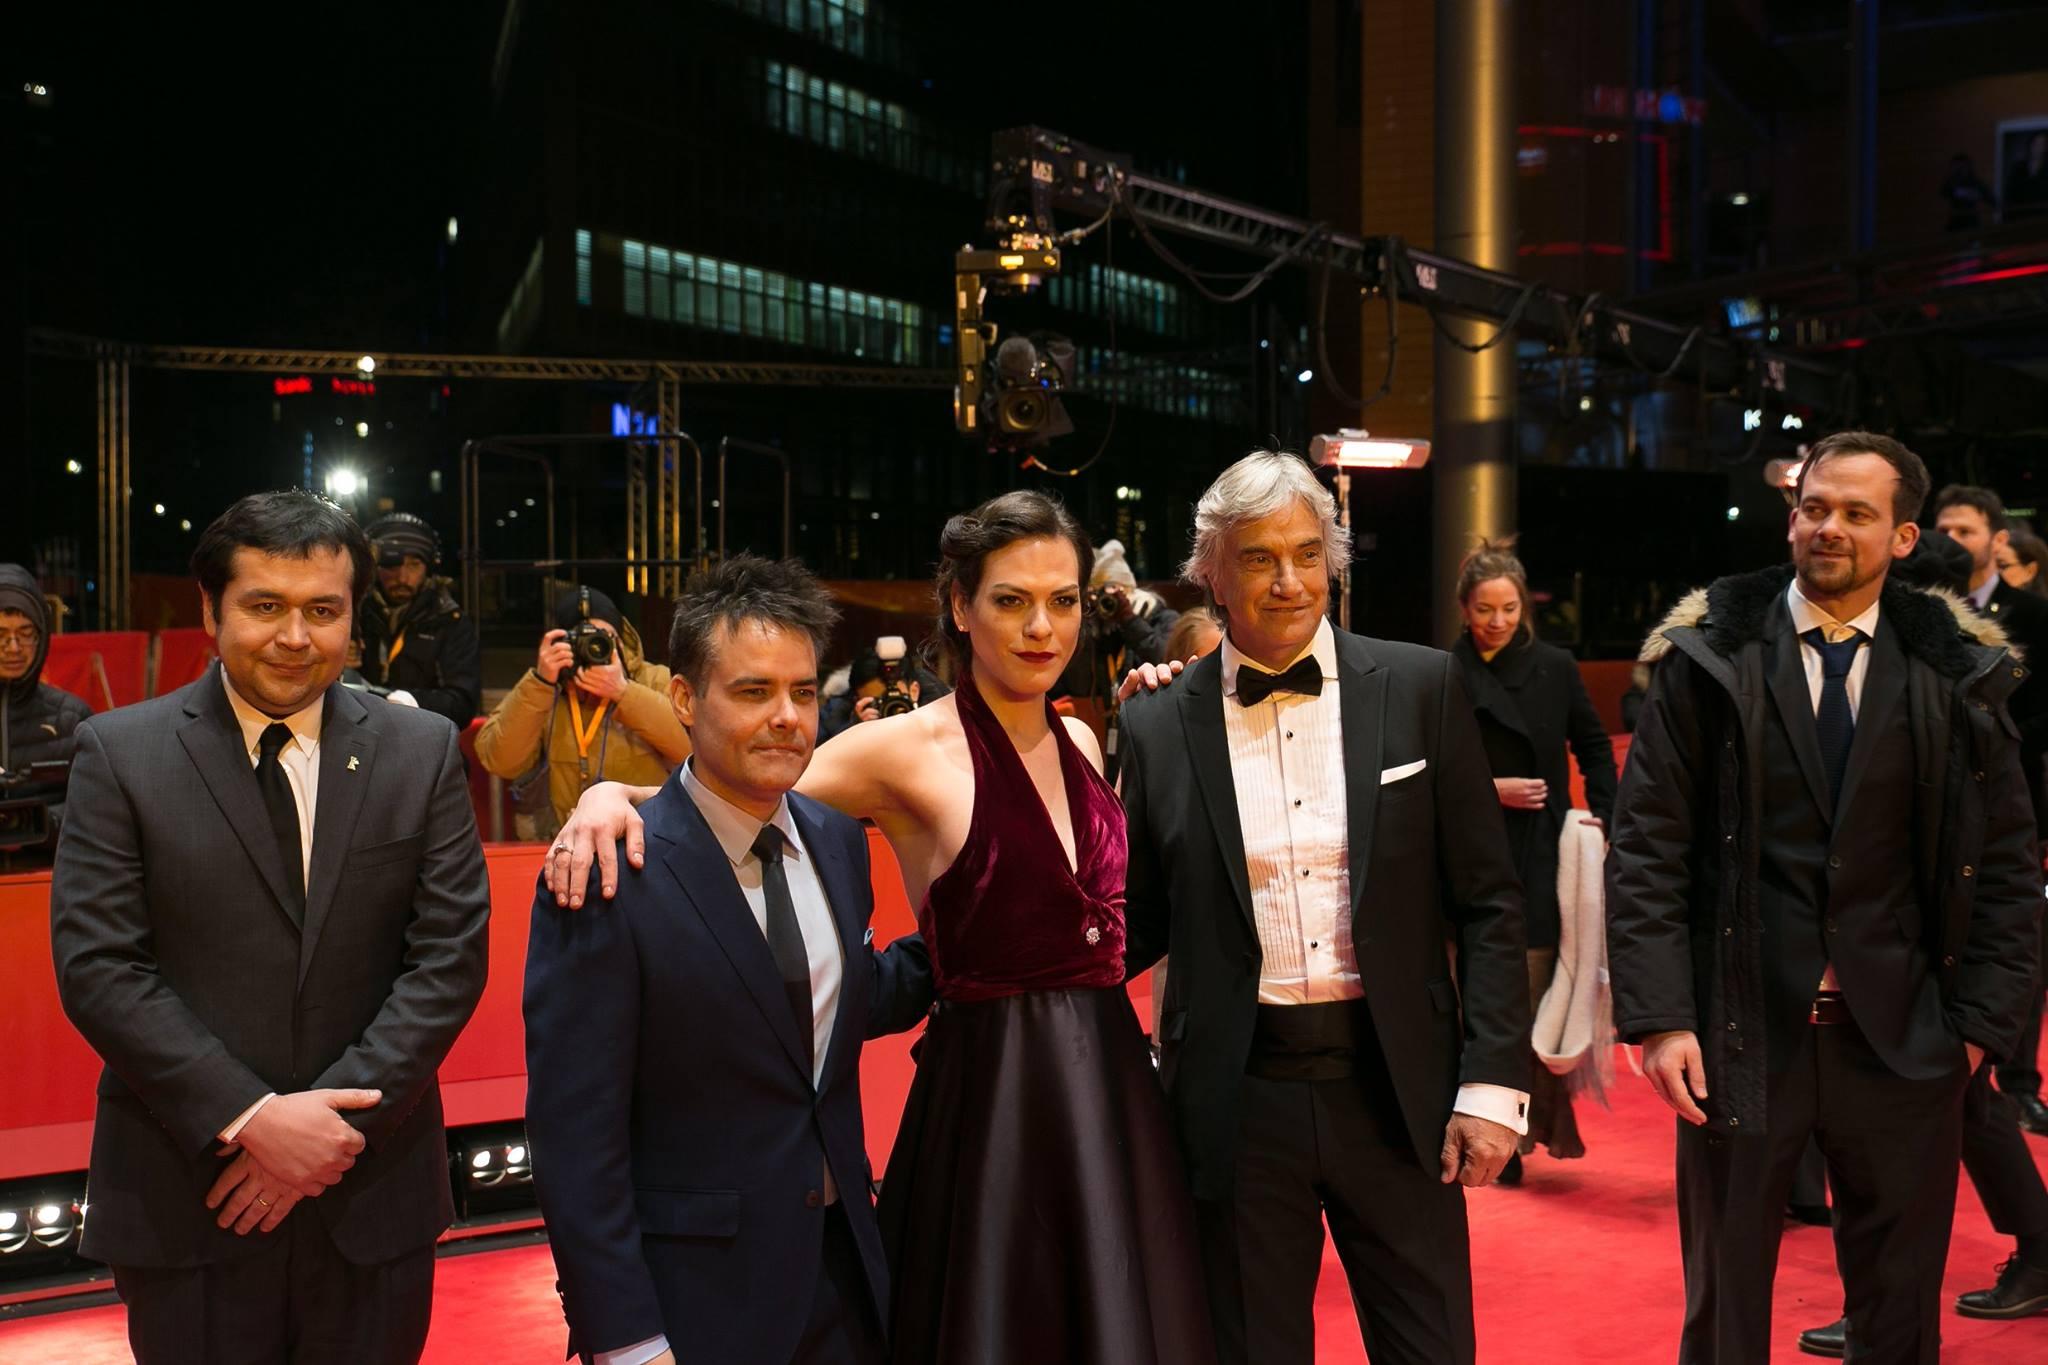 Lelio,k Vega y Reyes | Facebook Cinema Chile